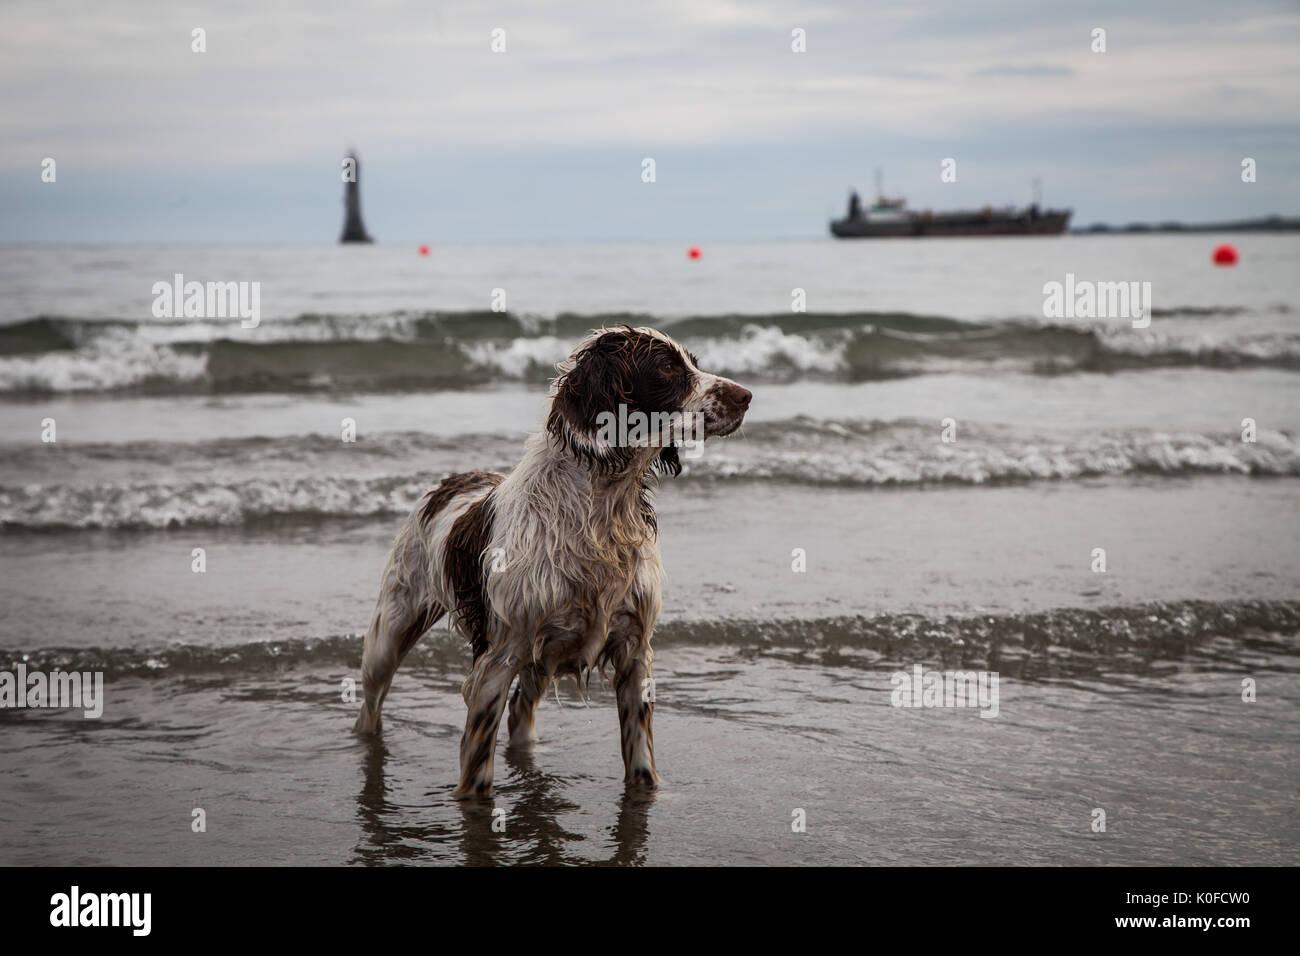 Dog on beach in Ireland - Stock Image